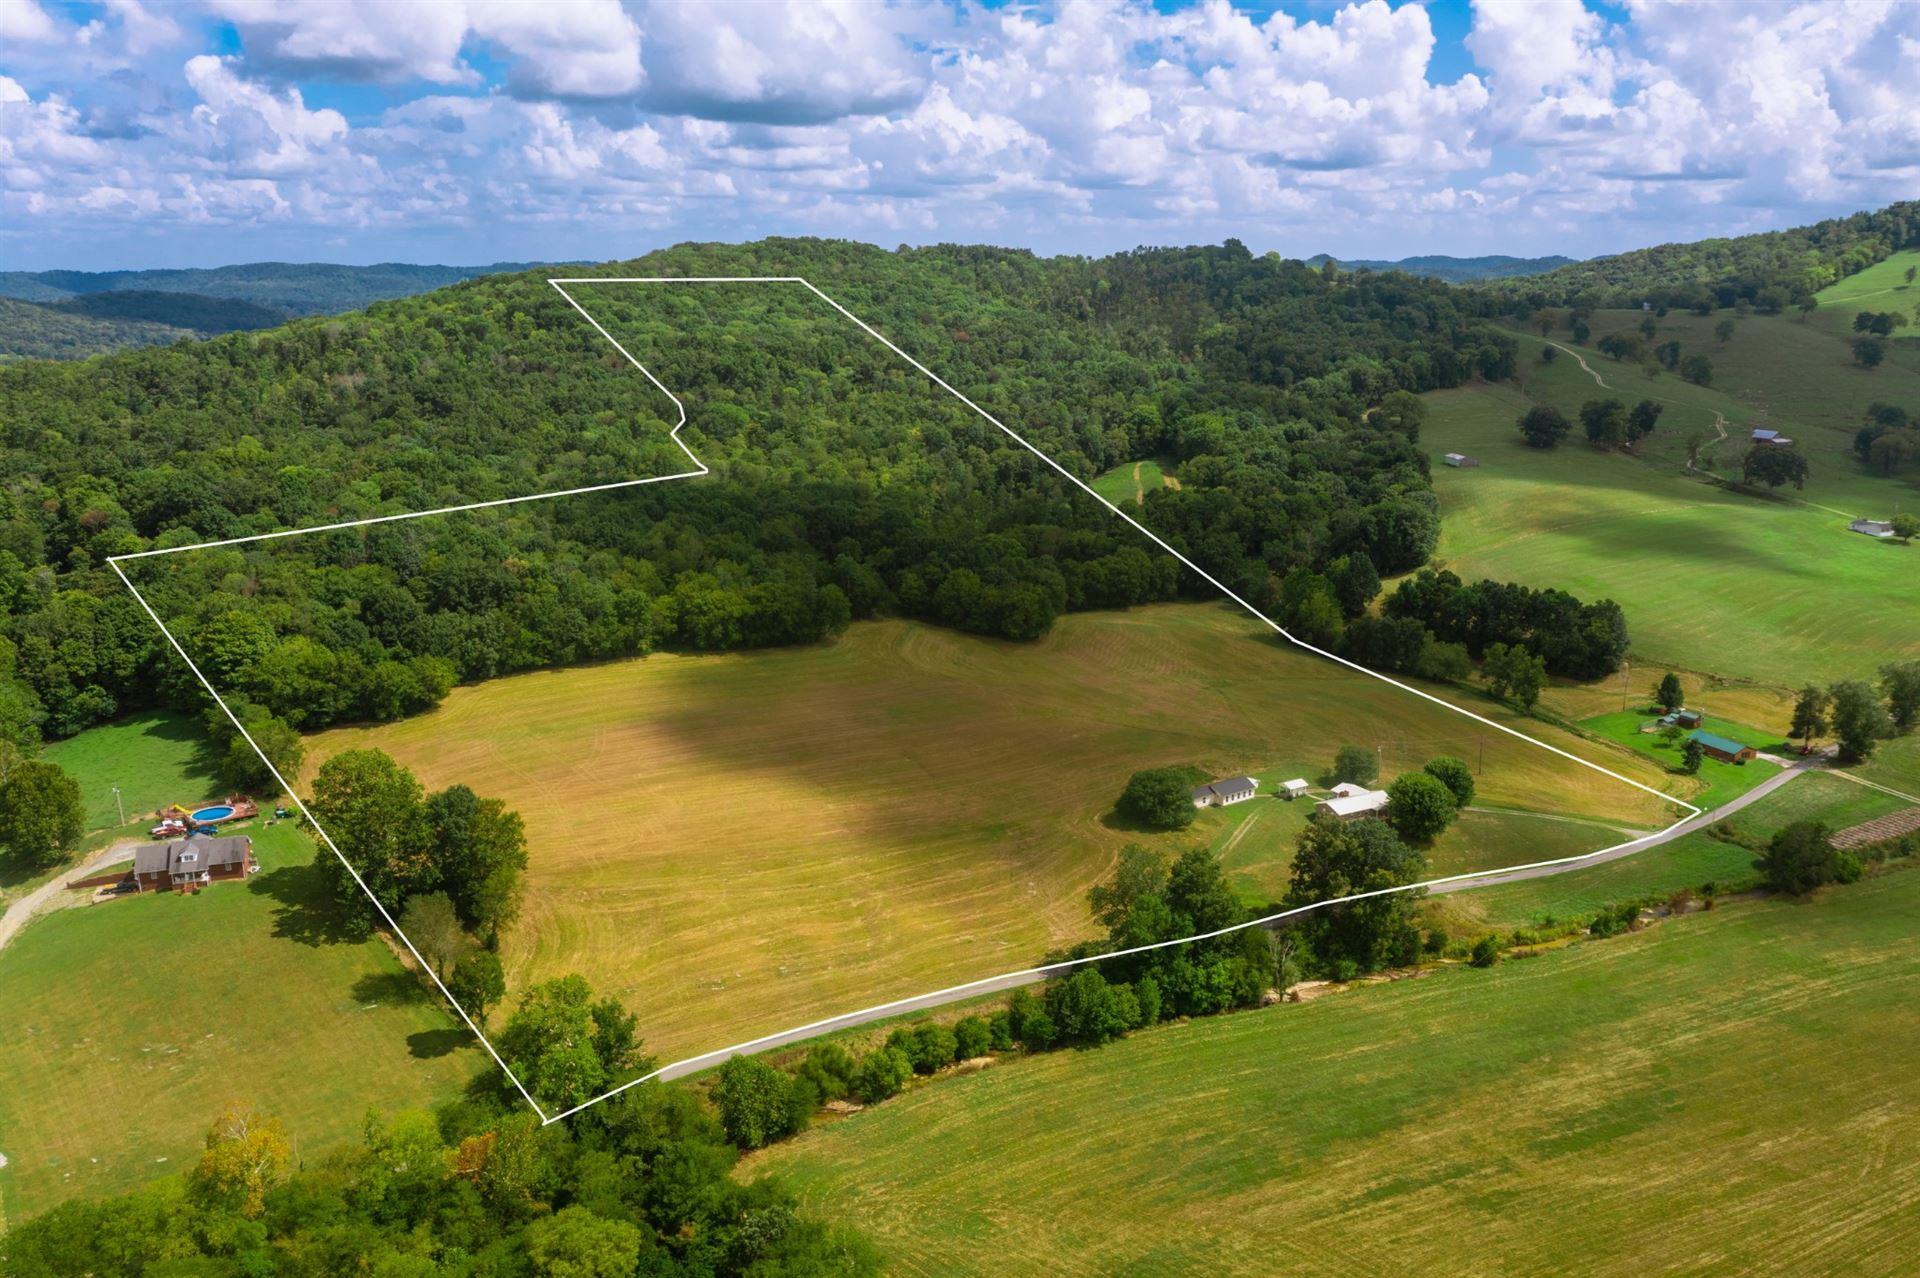 191 Dry Fork Rd, Brush Creek, TN 38547 - MLS#: 2290454